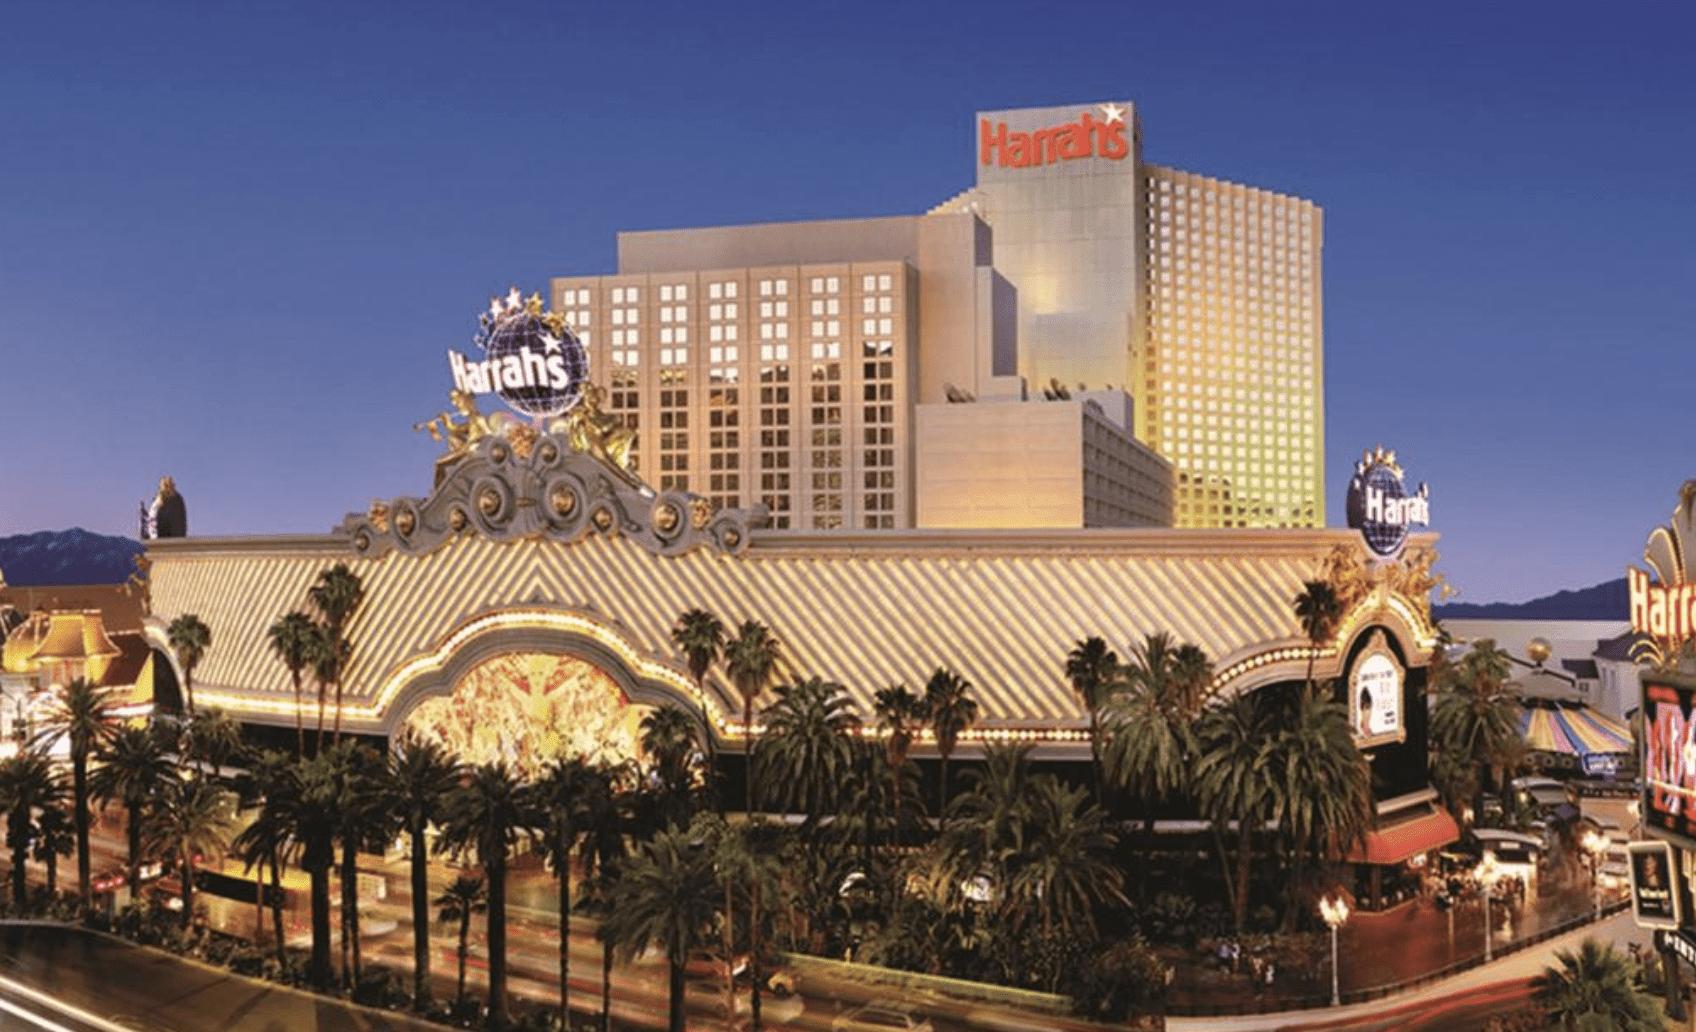 Harrah's Las Vegas estreia mesa de dados digital